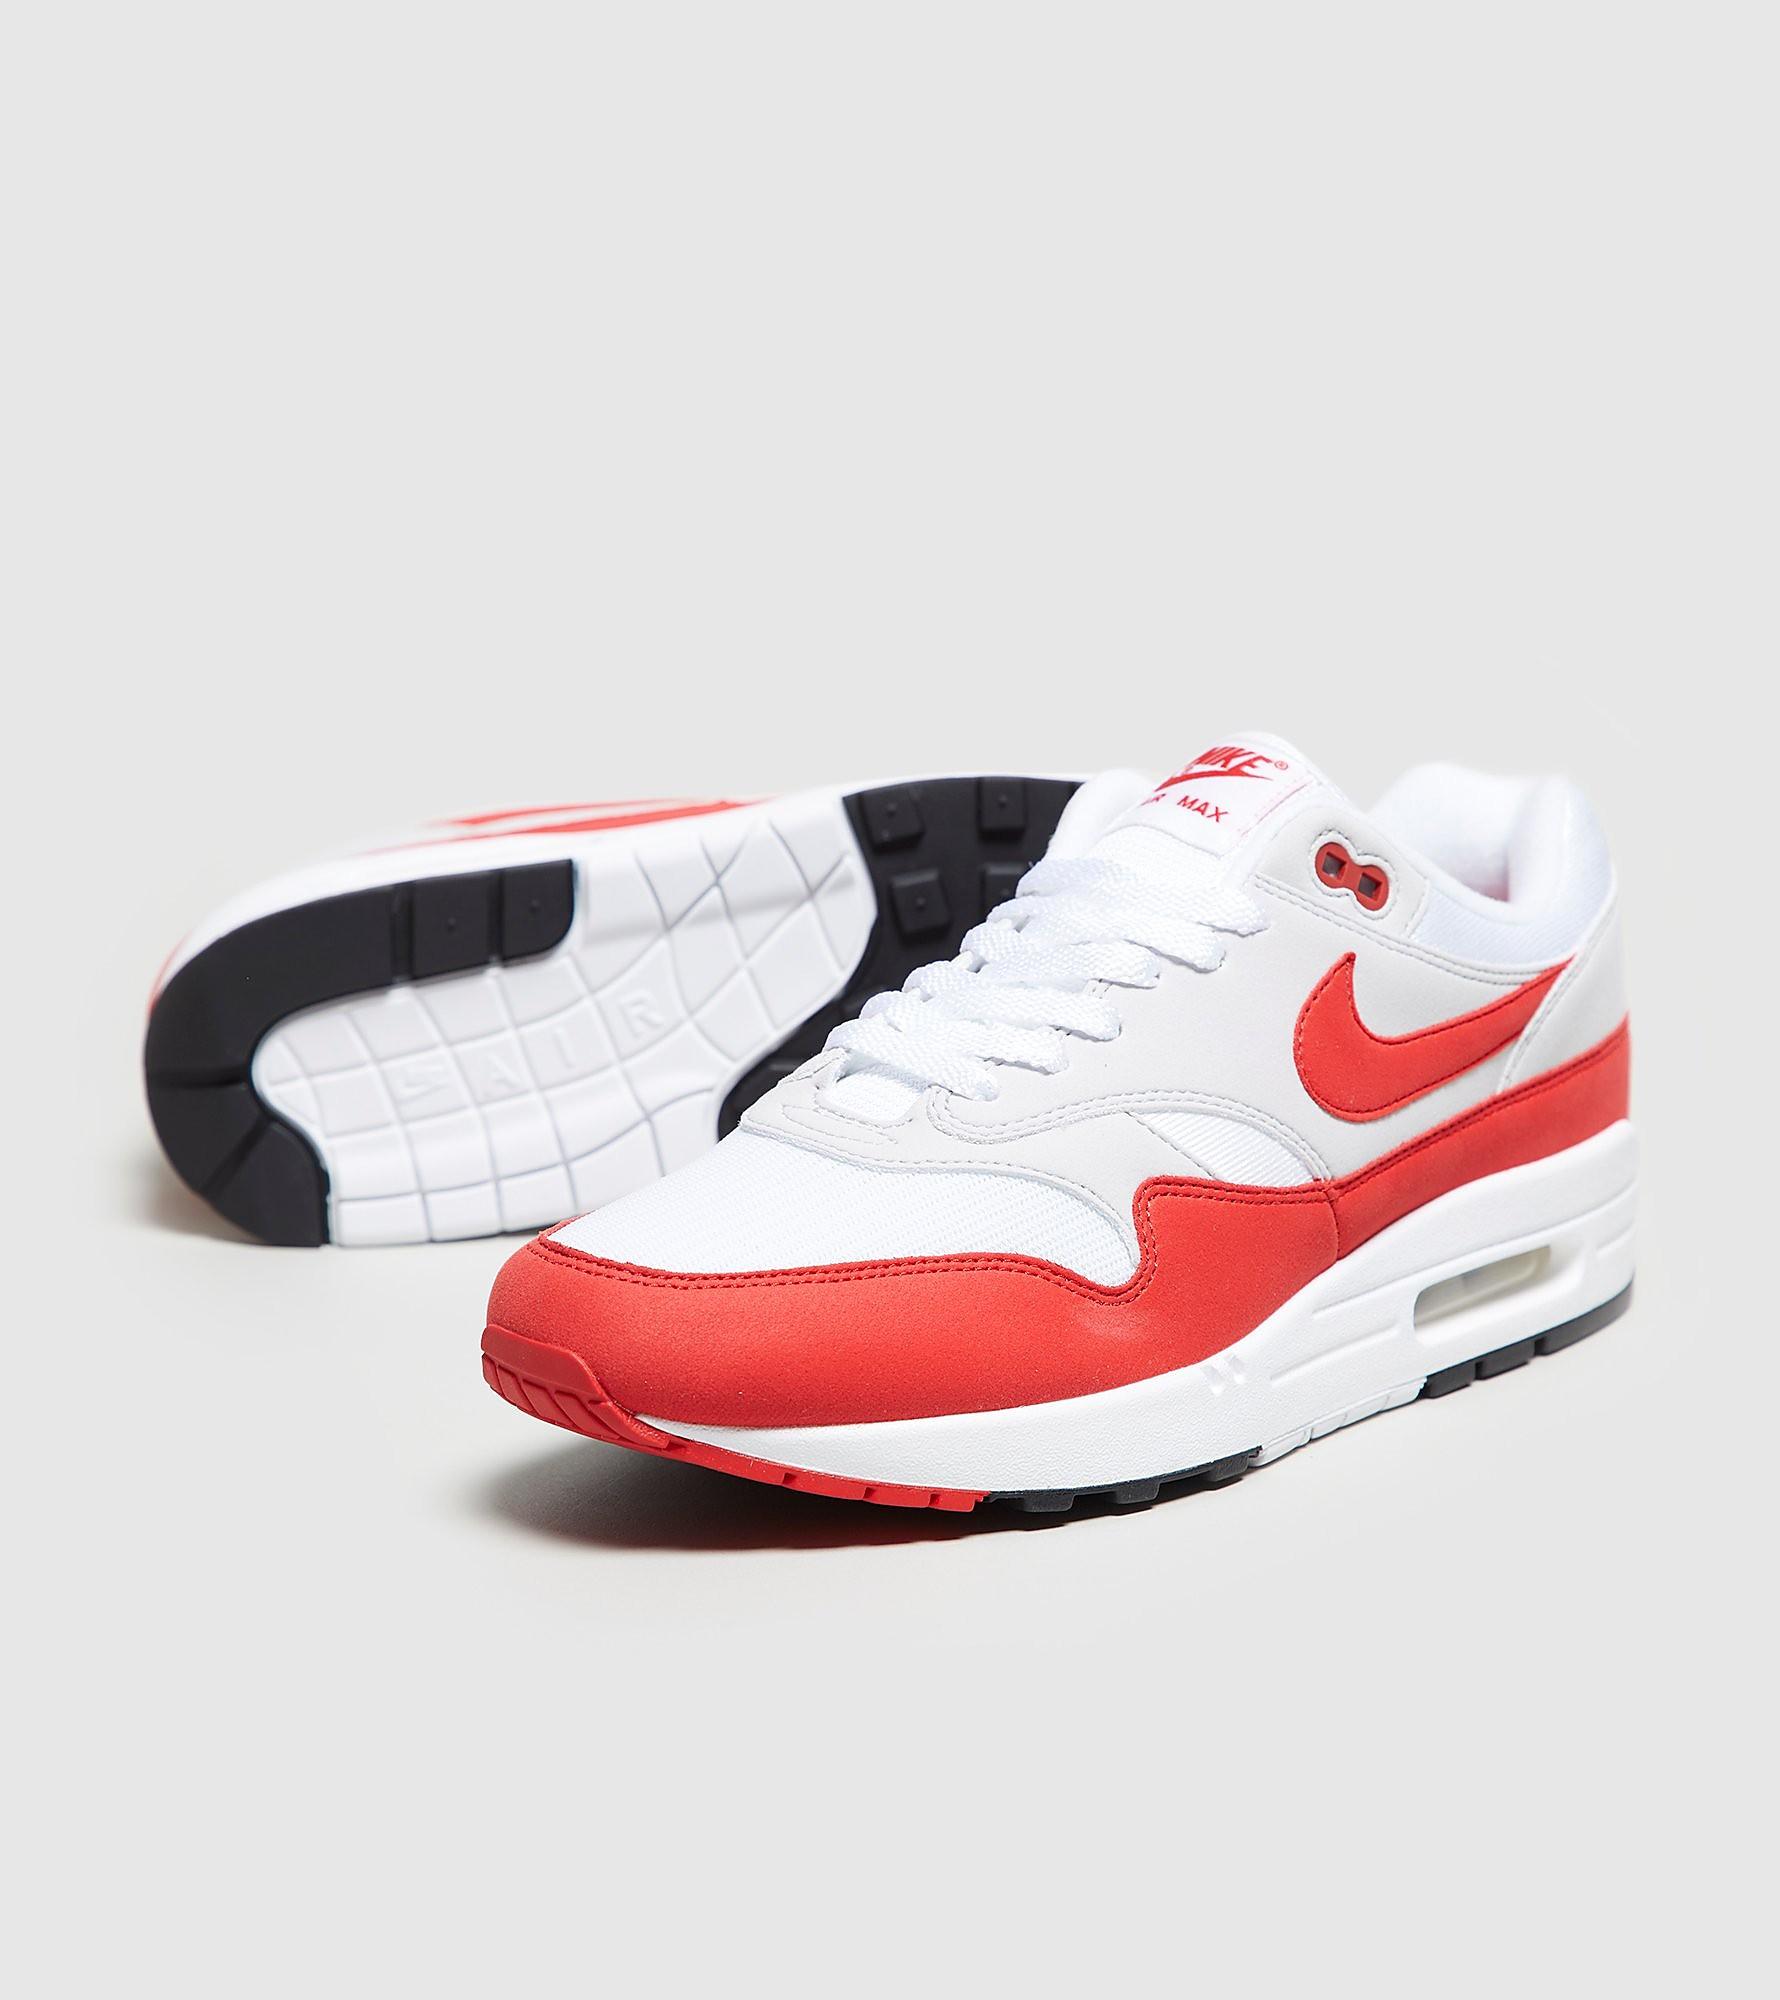 Nike Air Max 1 OG QS